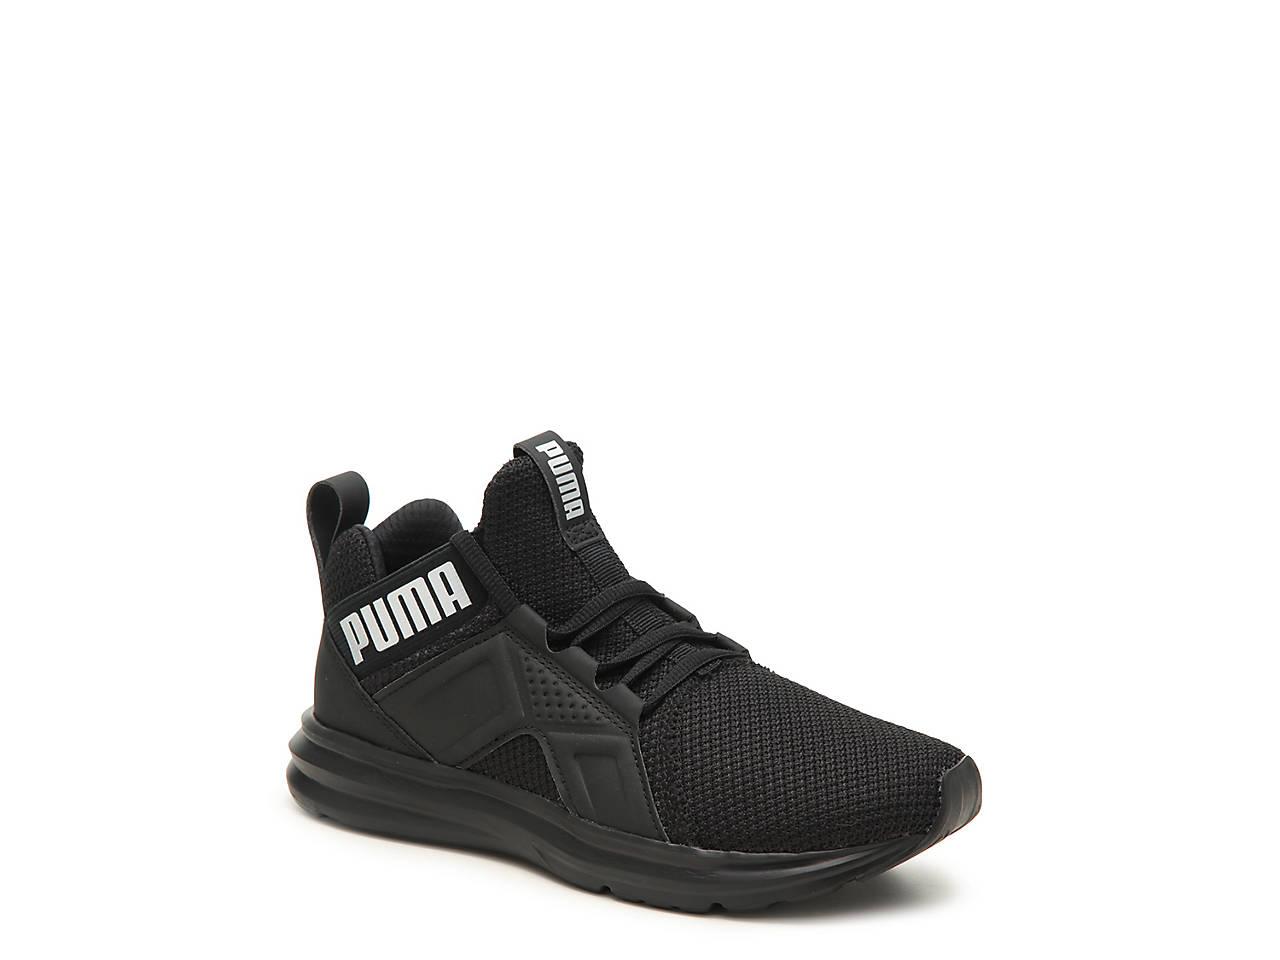 68a5c6ab9d Puma Enzo Weave Jr Youth Sneaker Kids Shoes | DSW